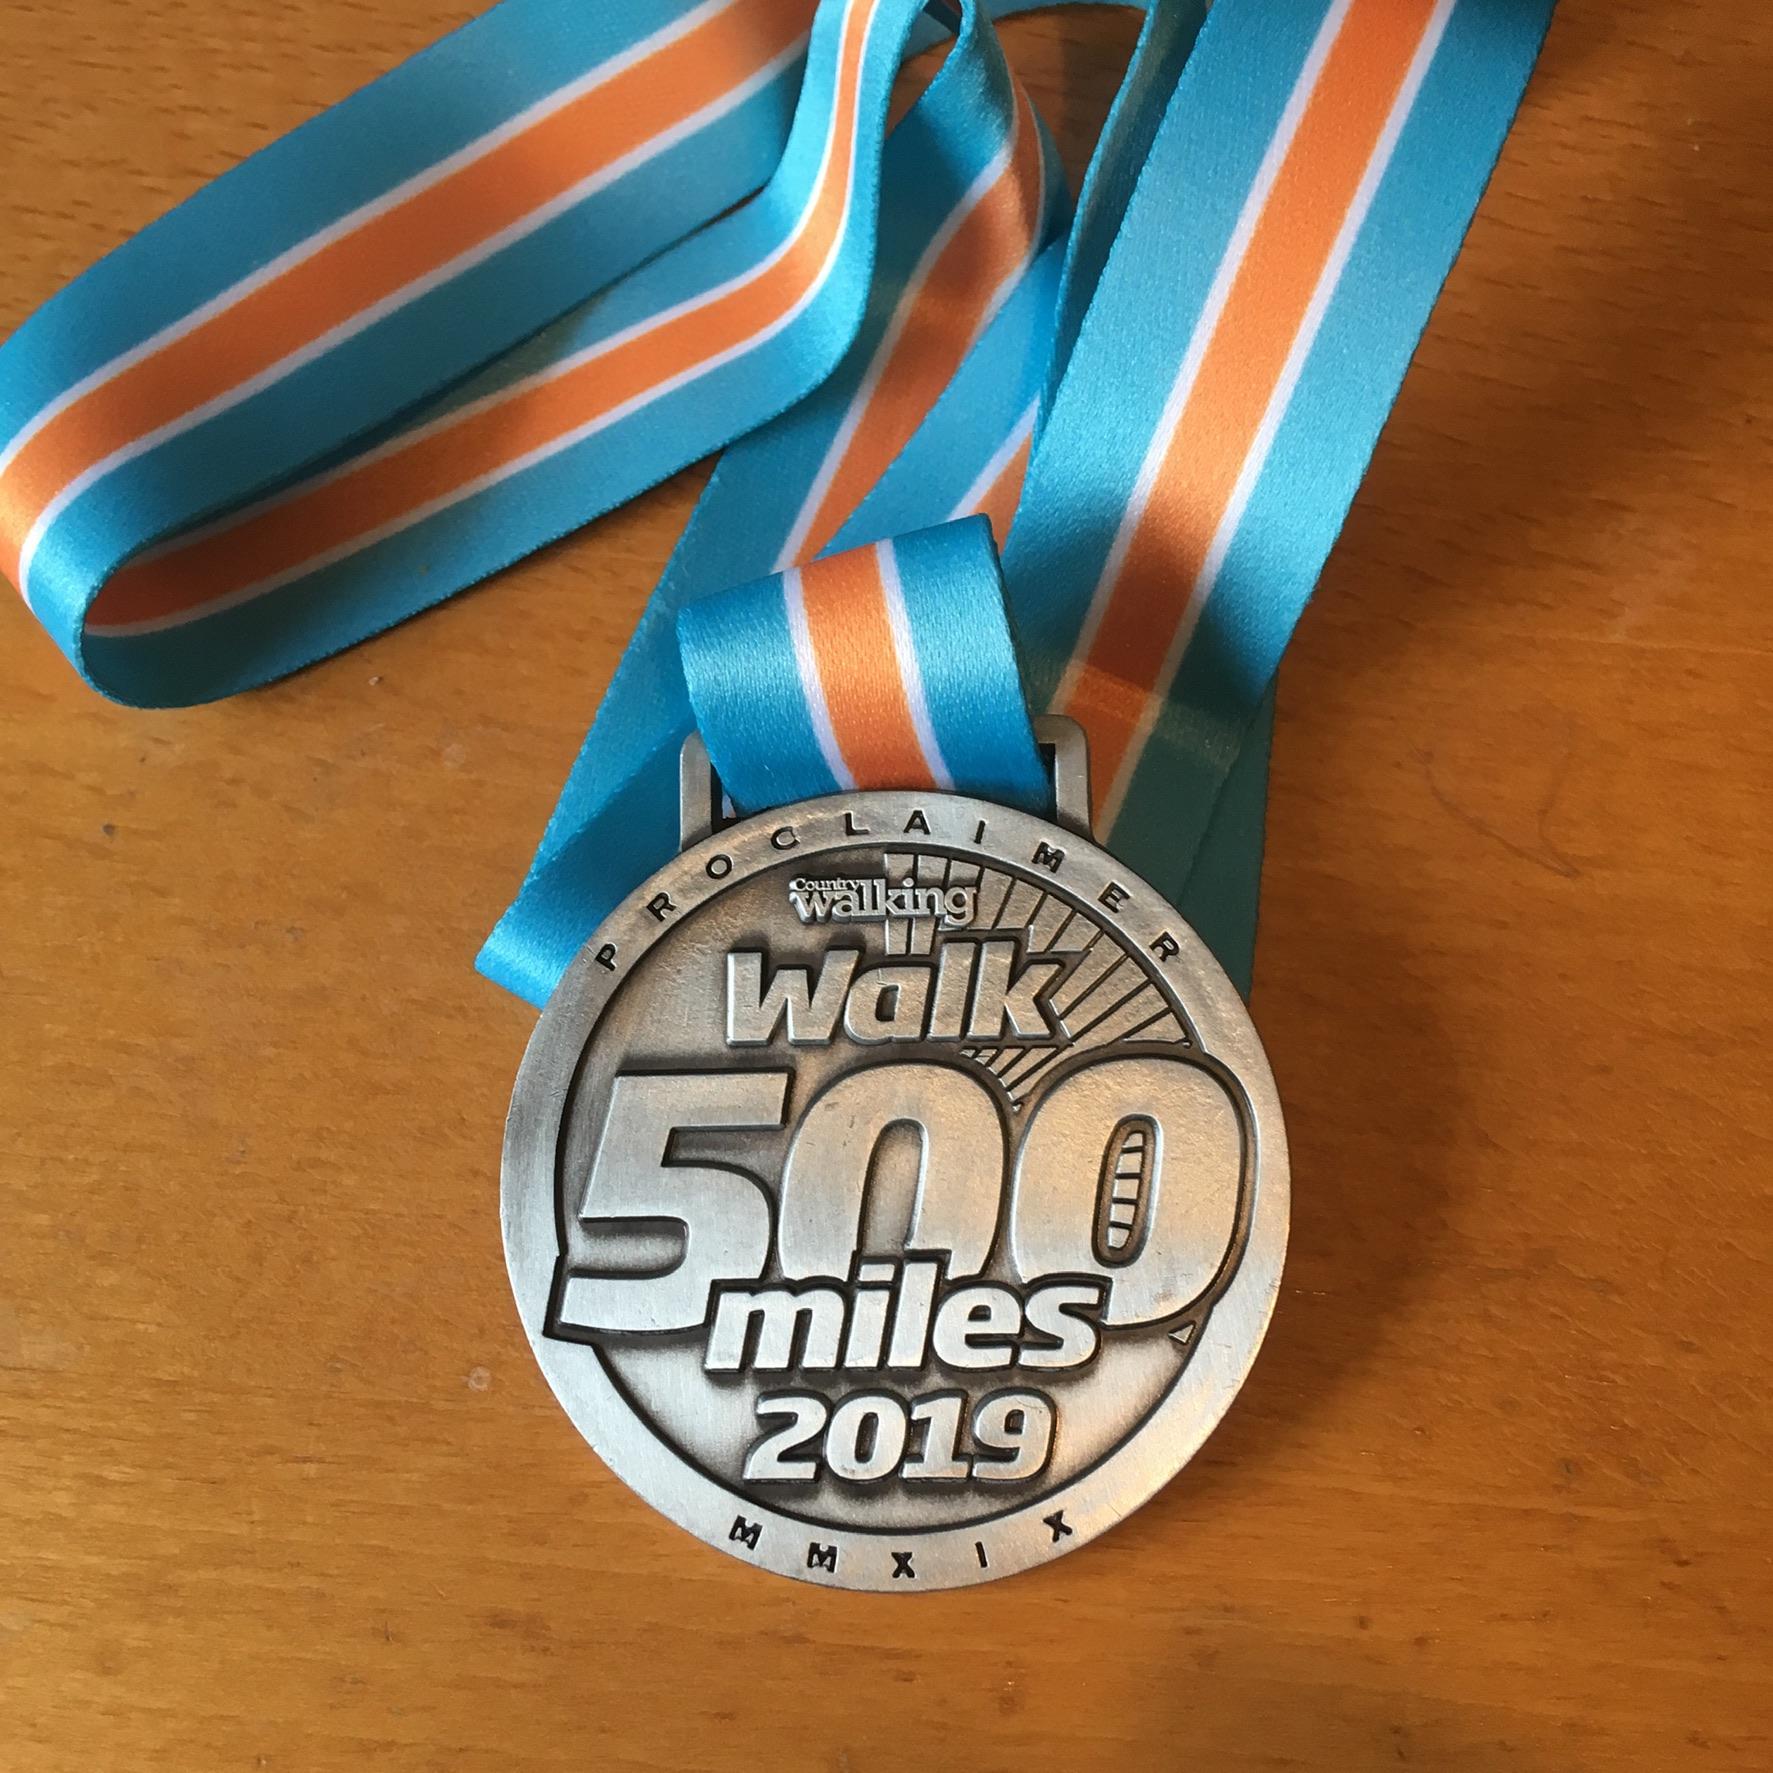 My 500 miles medal!